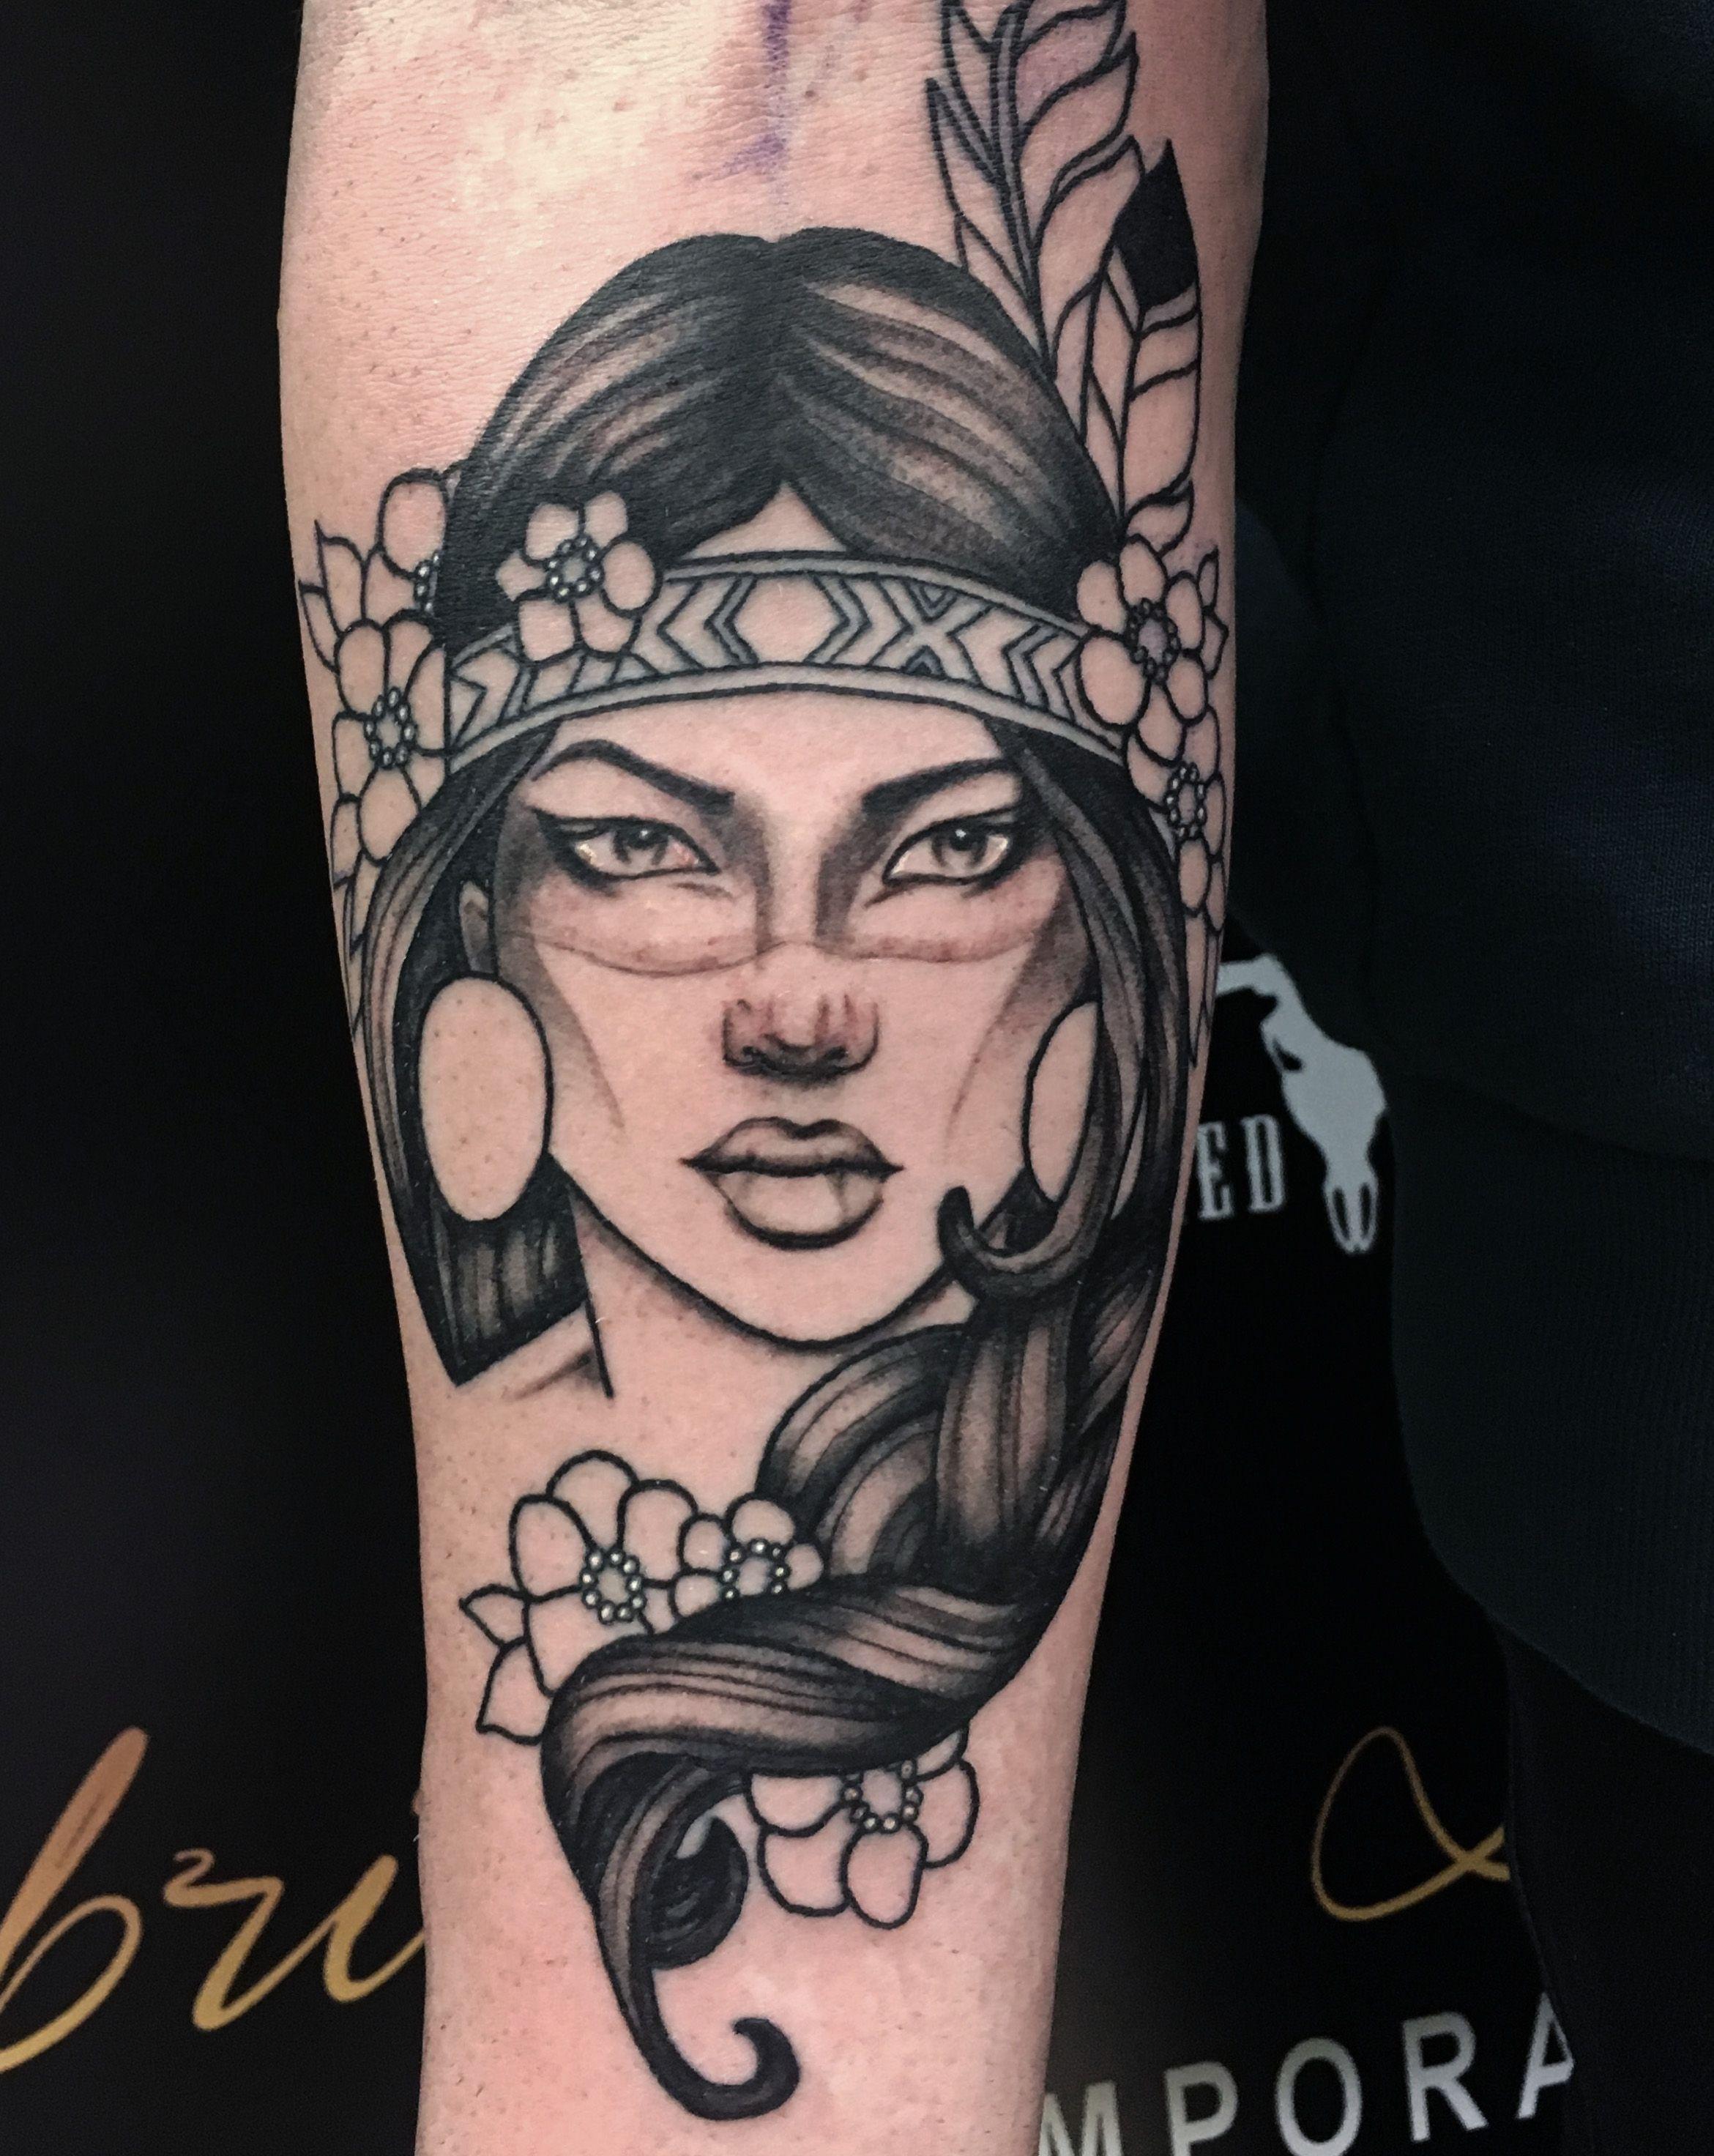 Chickasaw Tattoo : chickasaw, tattoo, Black, Grey,, Realism,, Traditonal,, Native, American,, Indian,, Woman,, Woman, Tattoo, Chickasaw, Indian, Tattoo,, Tattoos, Women,